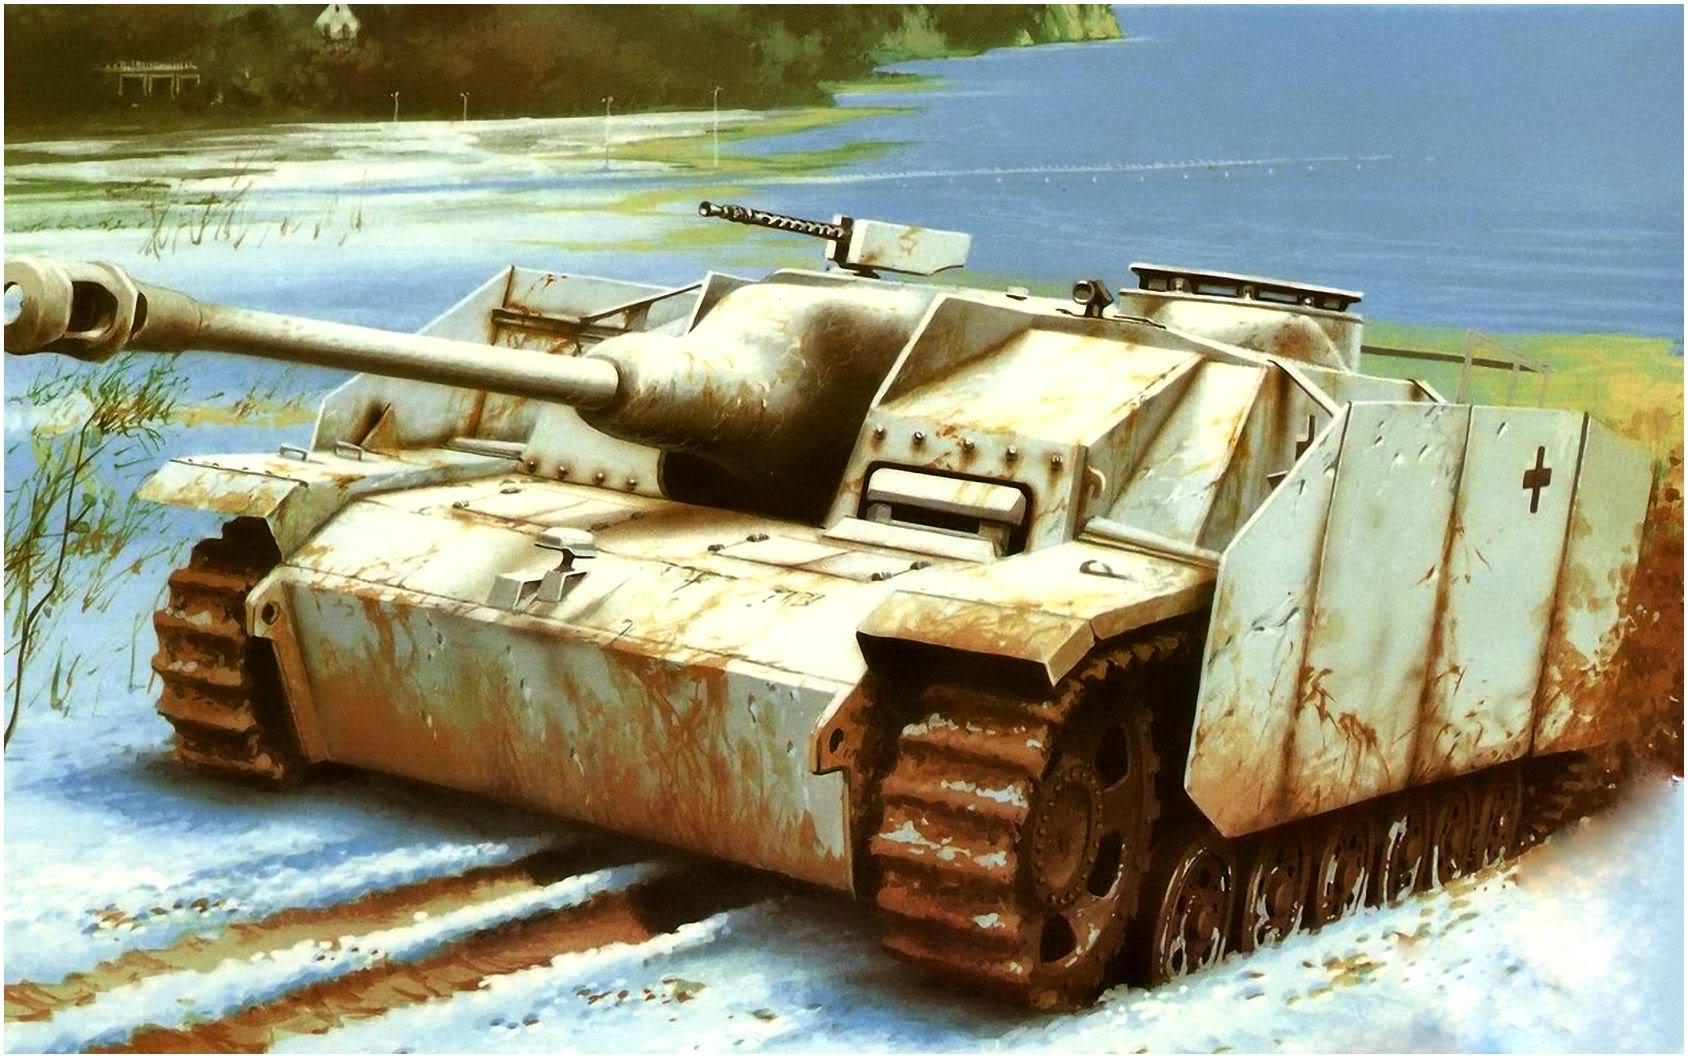 Wróbel Arkadiusz. САУ Sturmgeschutz III Ausf G.